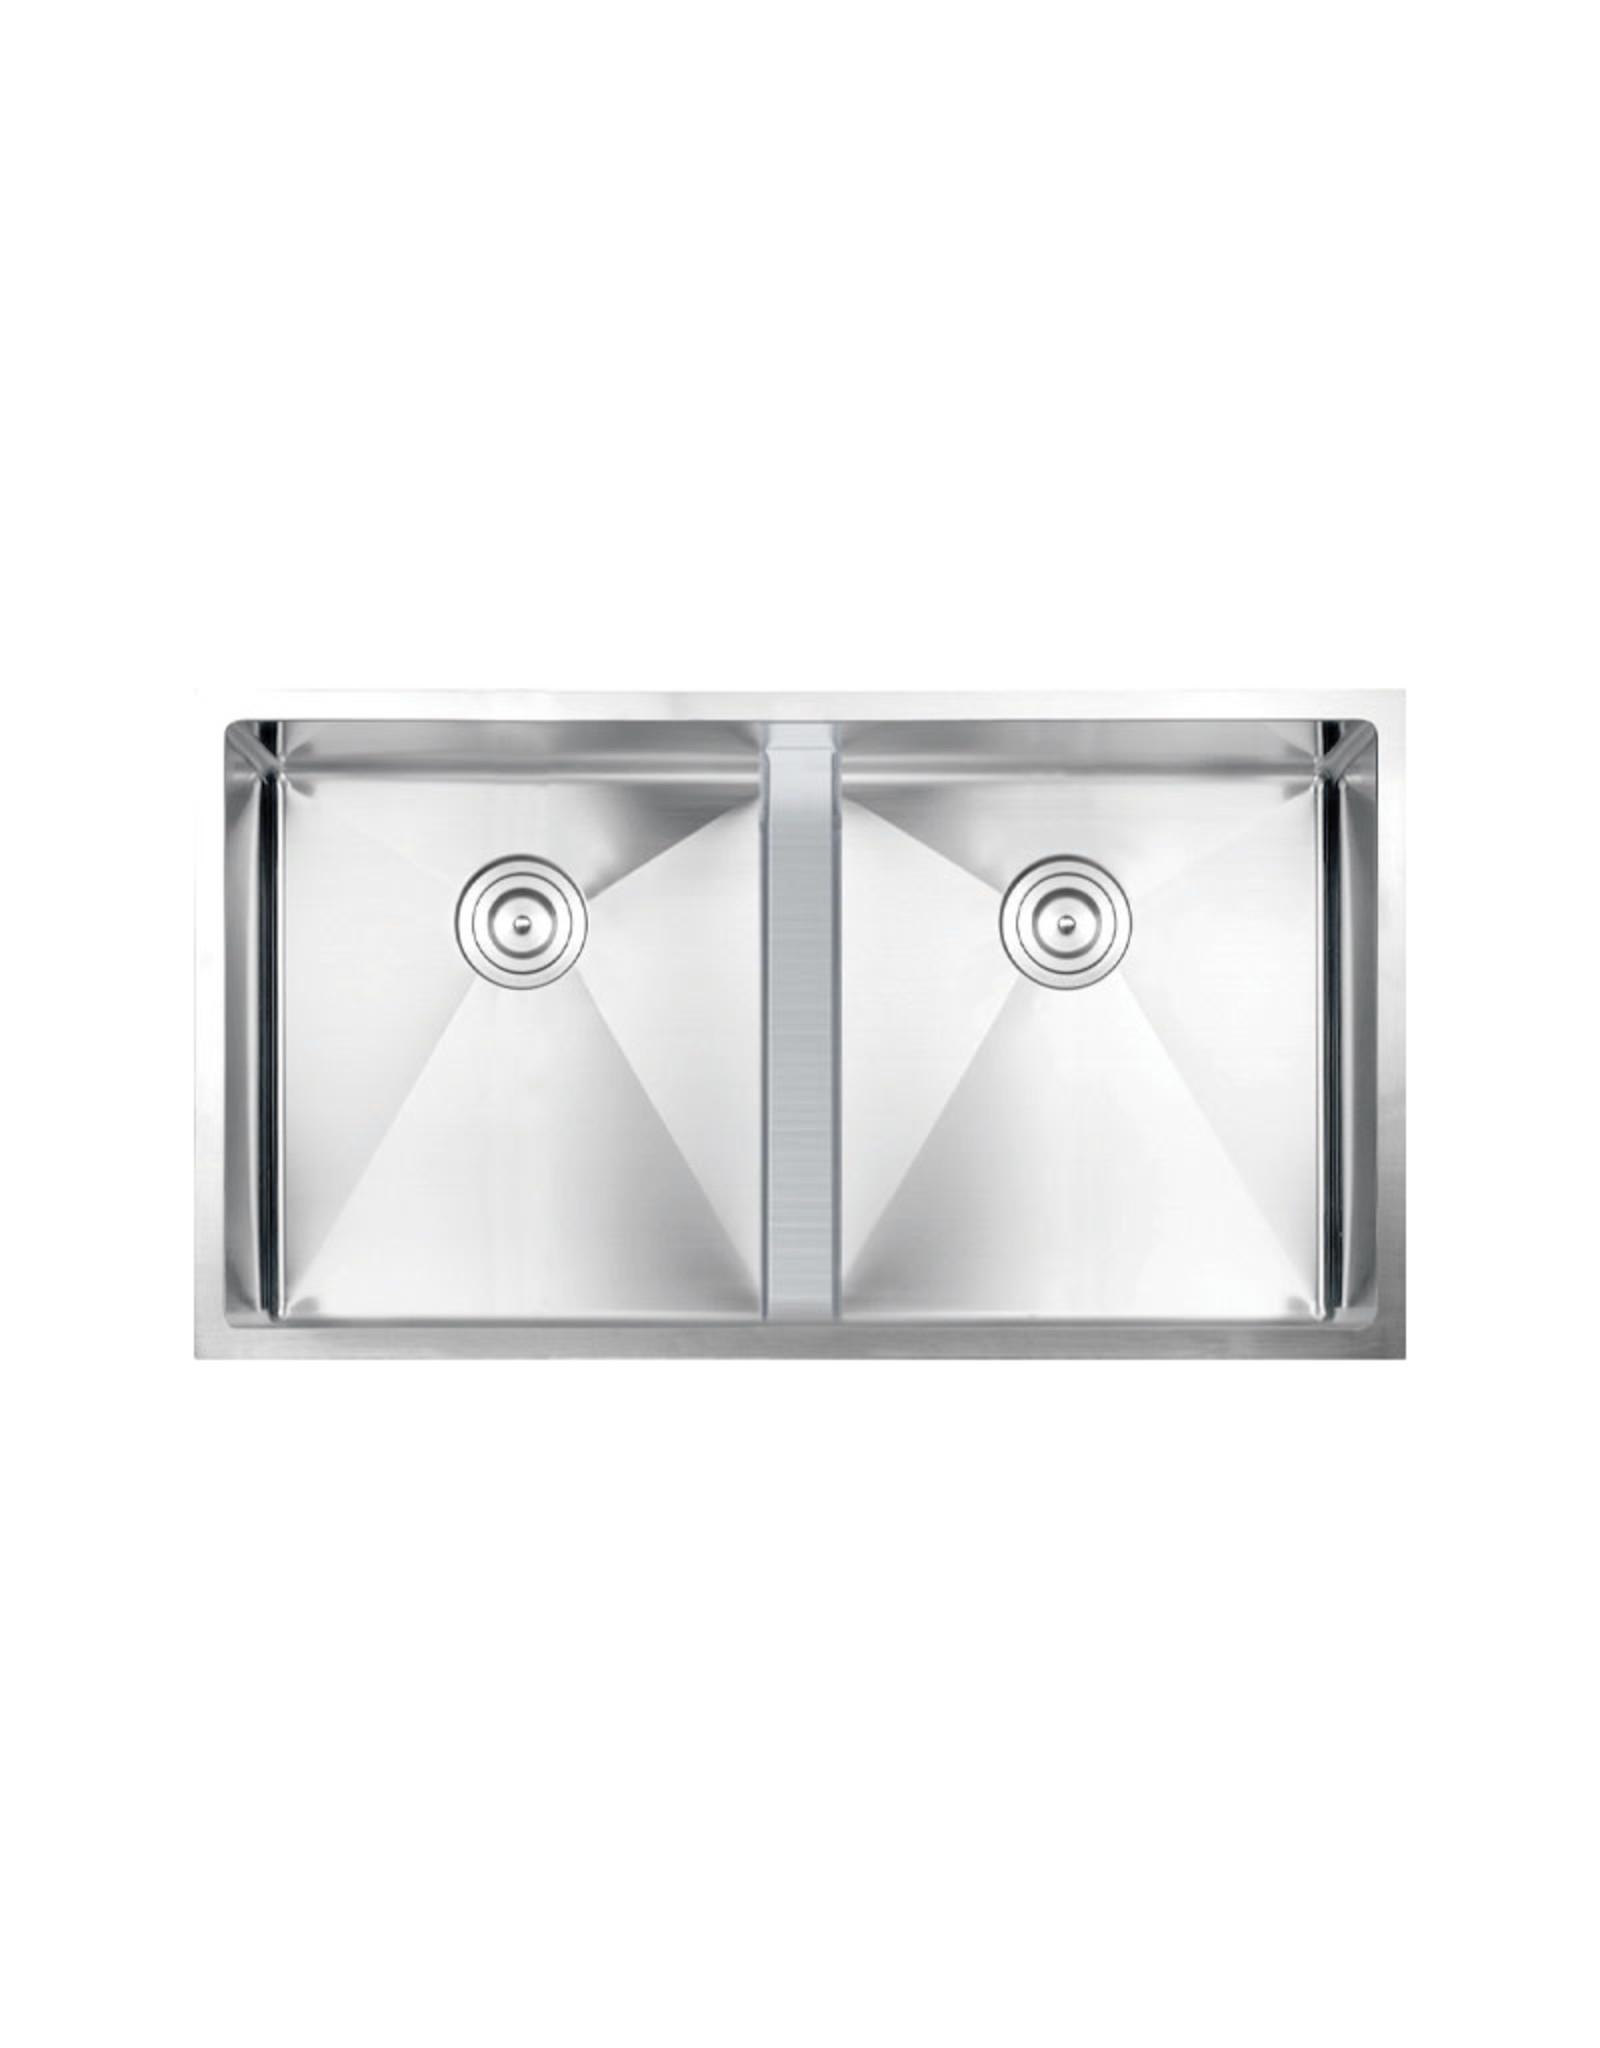 "Vogt Lavanttal 16R Undermount Kitchen Sink Double Bowl (50/50) 34"" x 18"" x 10"" With Bottom Grids"